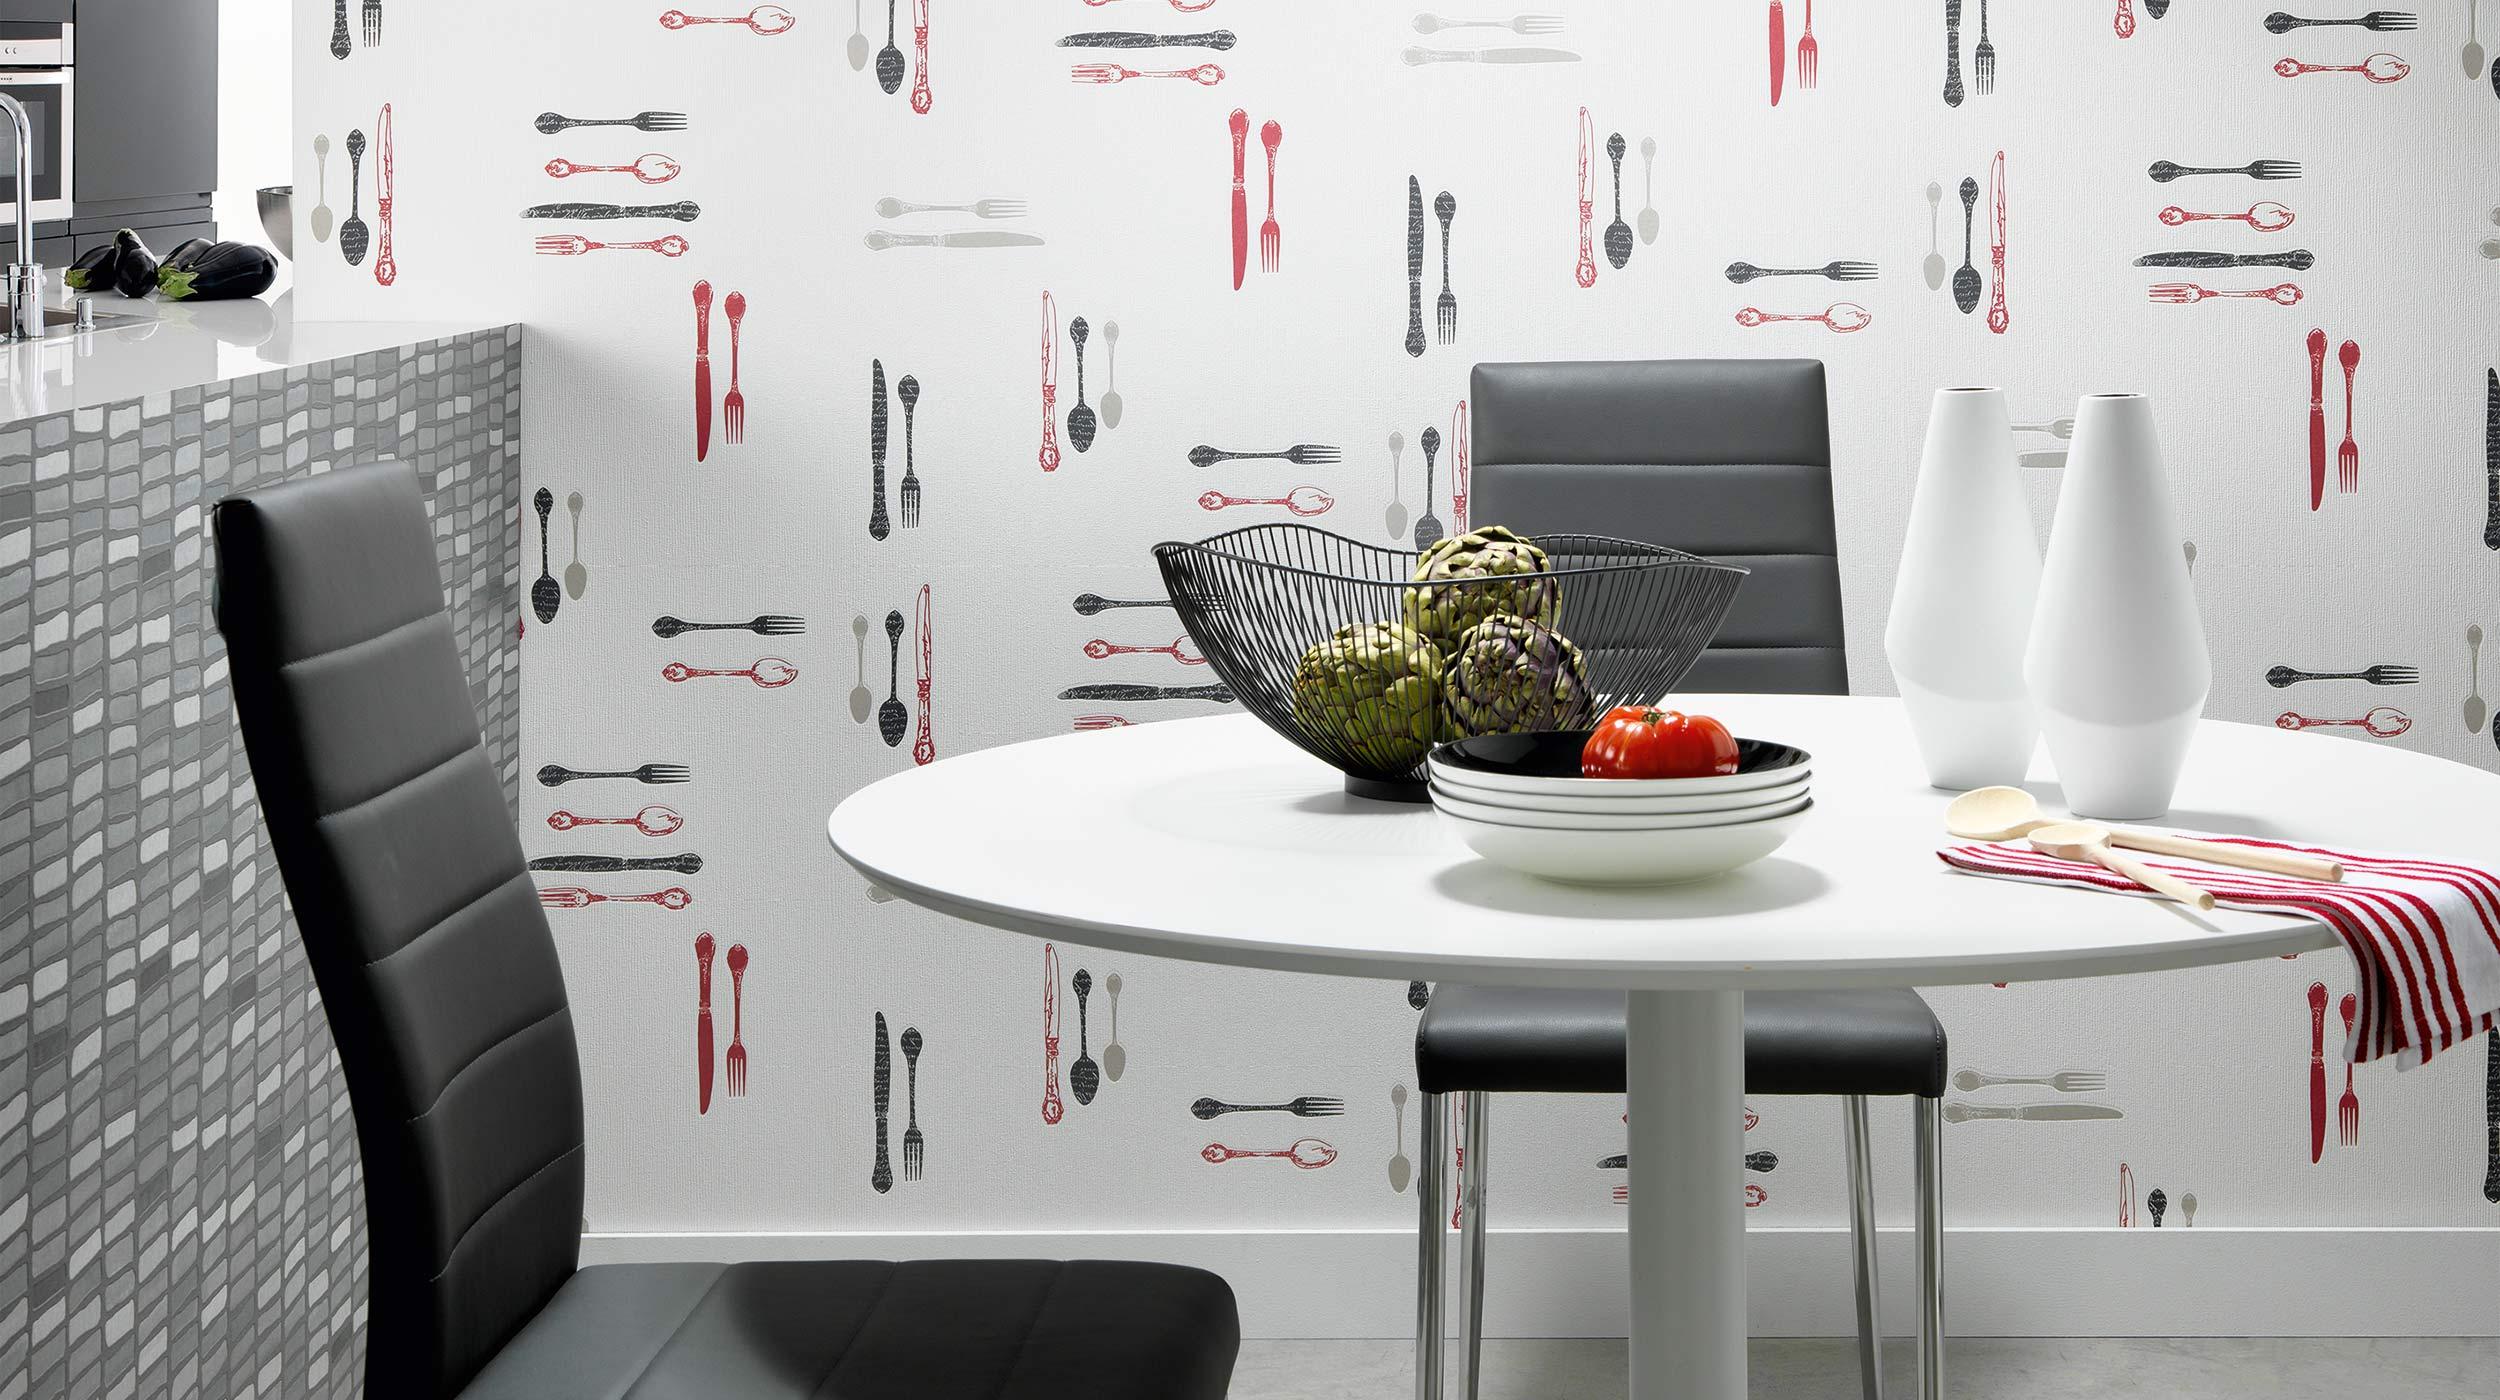 Tapeten Küche | Bnbnews.co